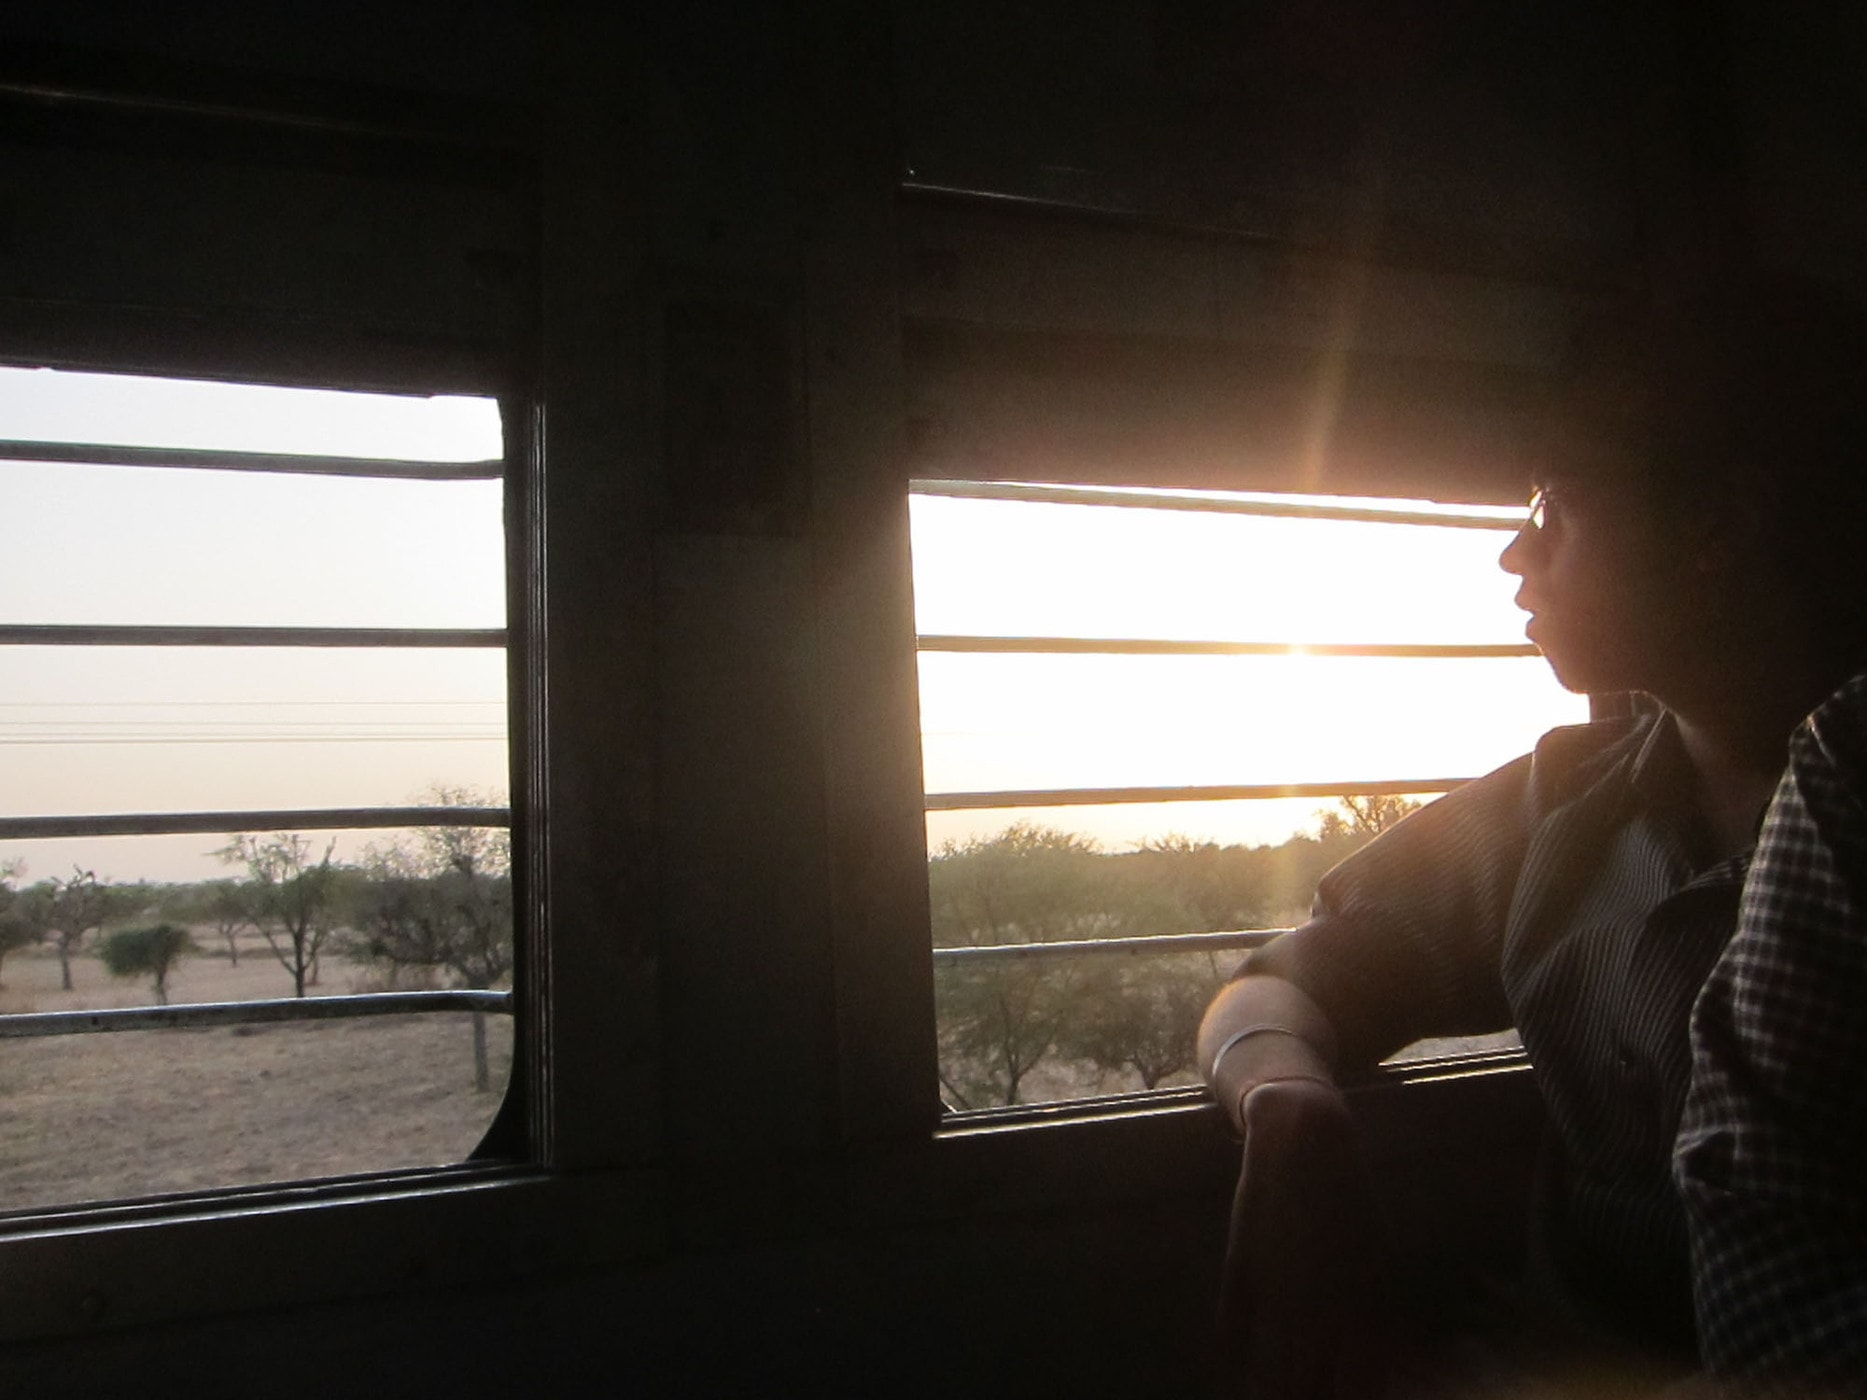 Train ride to Jodhpur, India.